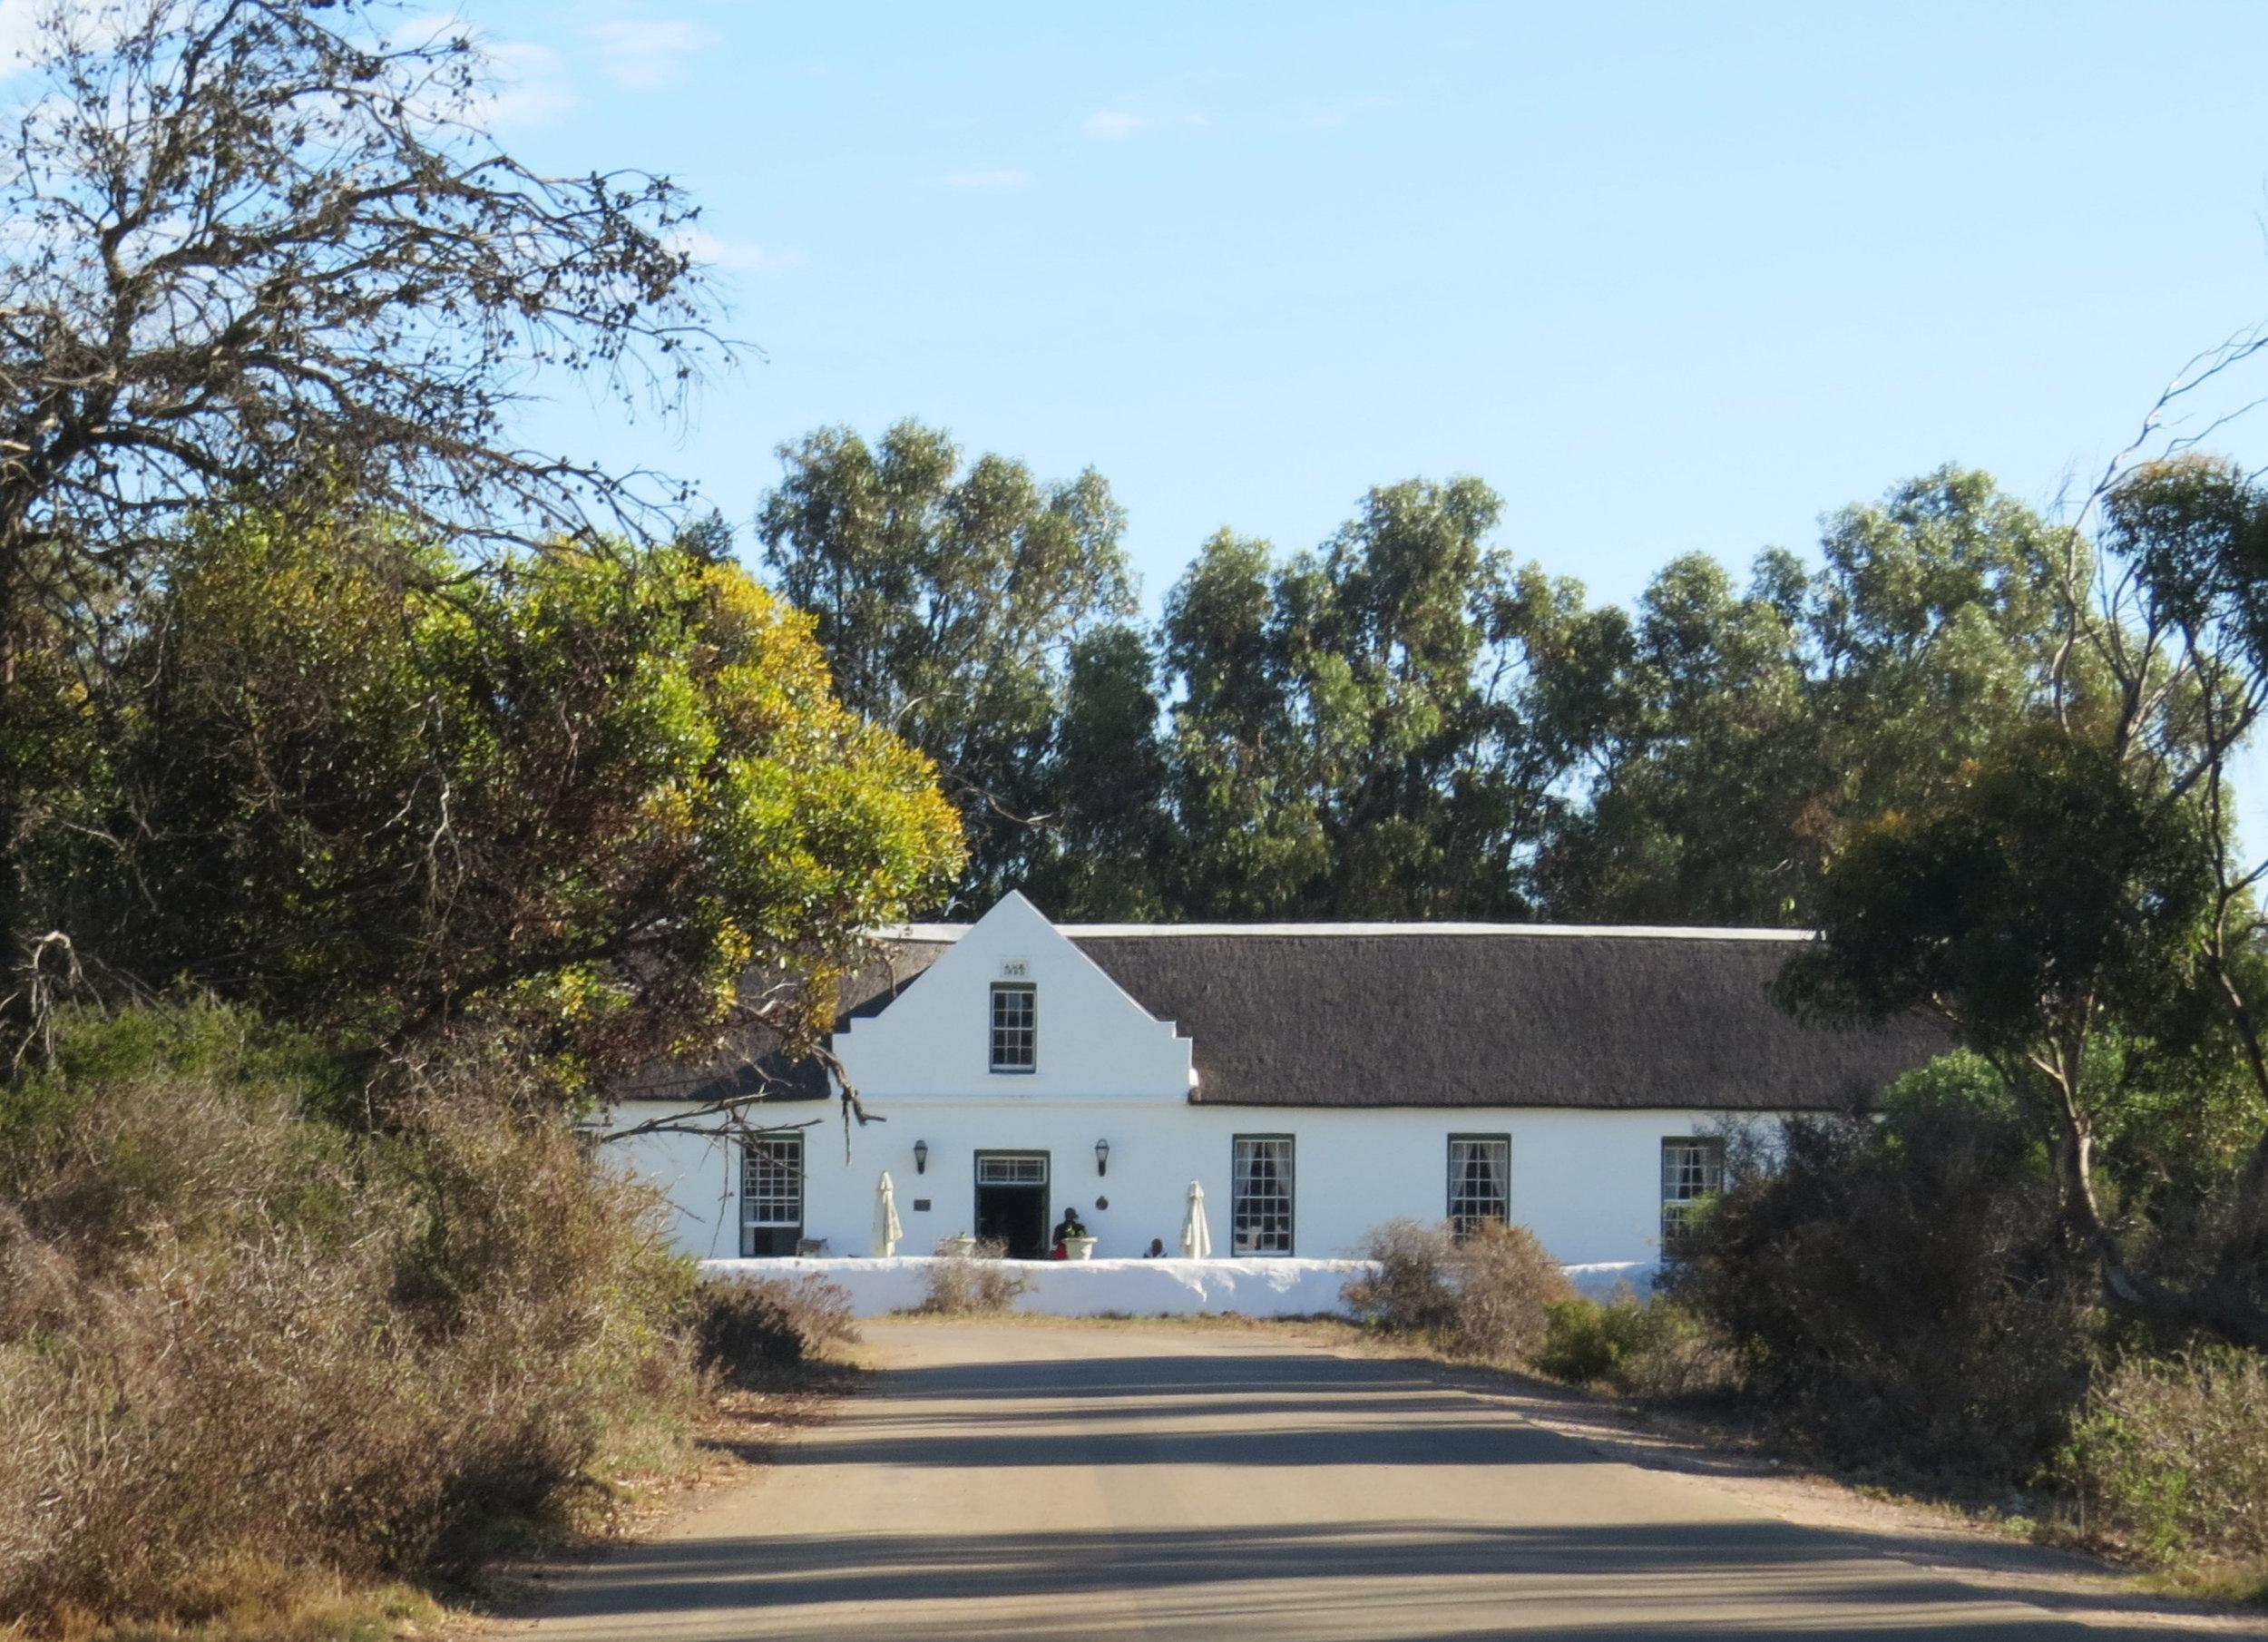 West Coast Natl Park Visitors Center